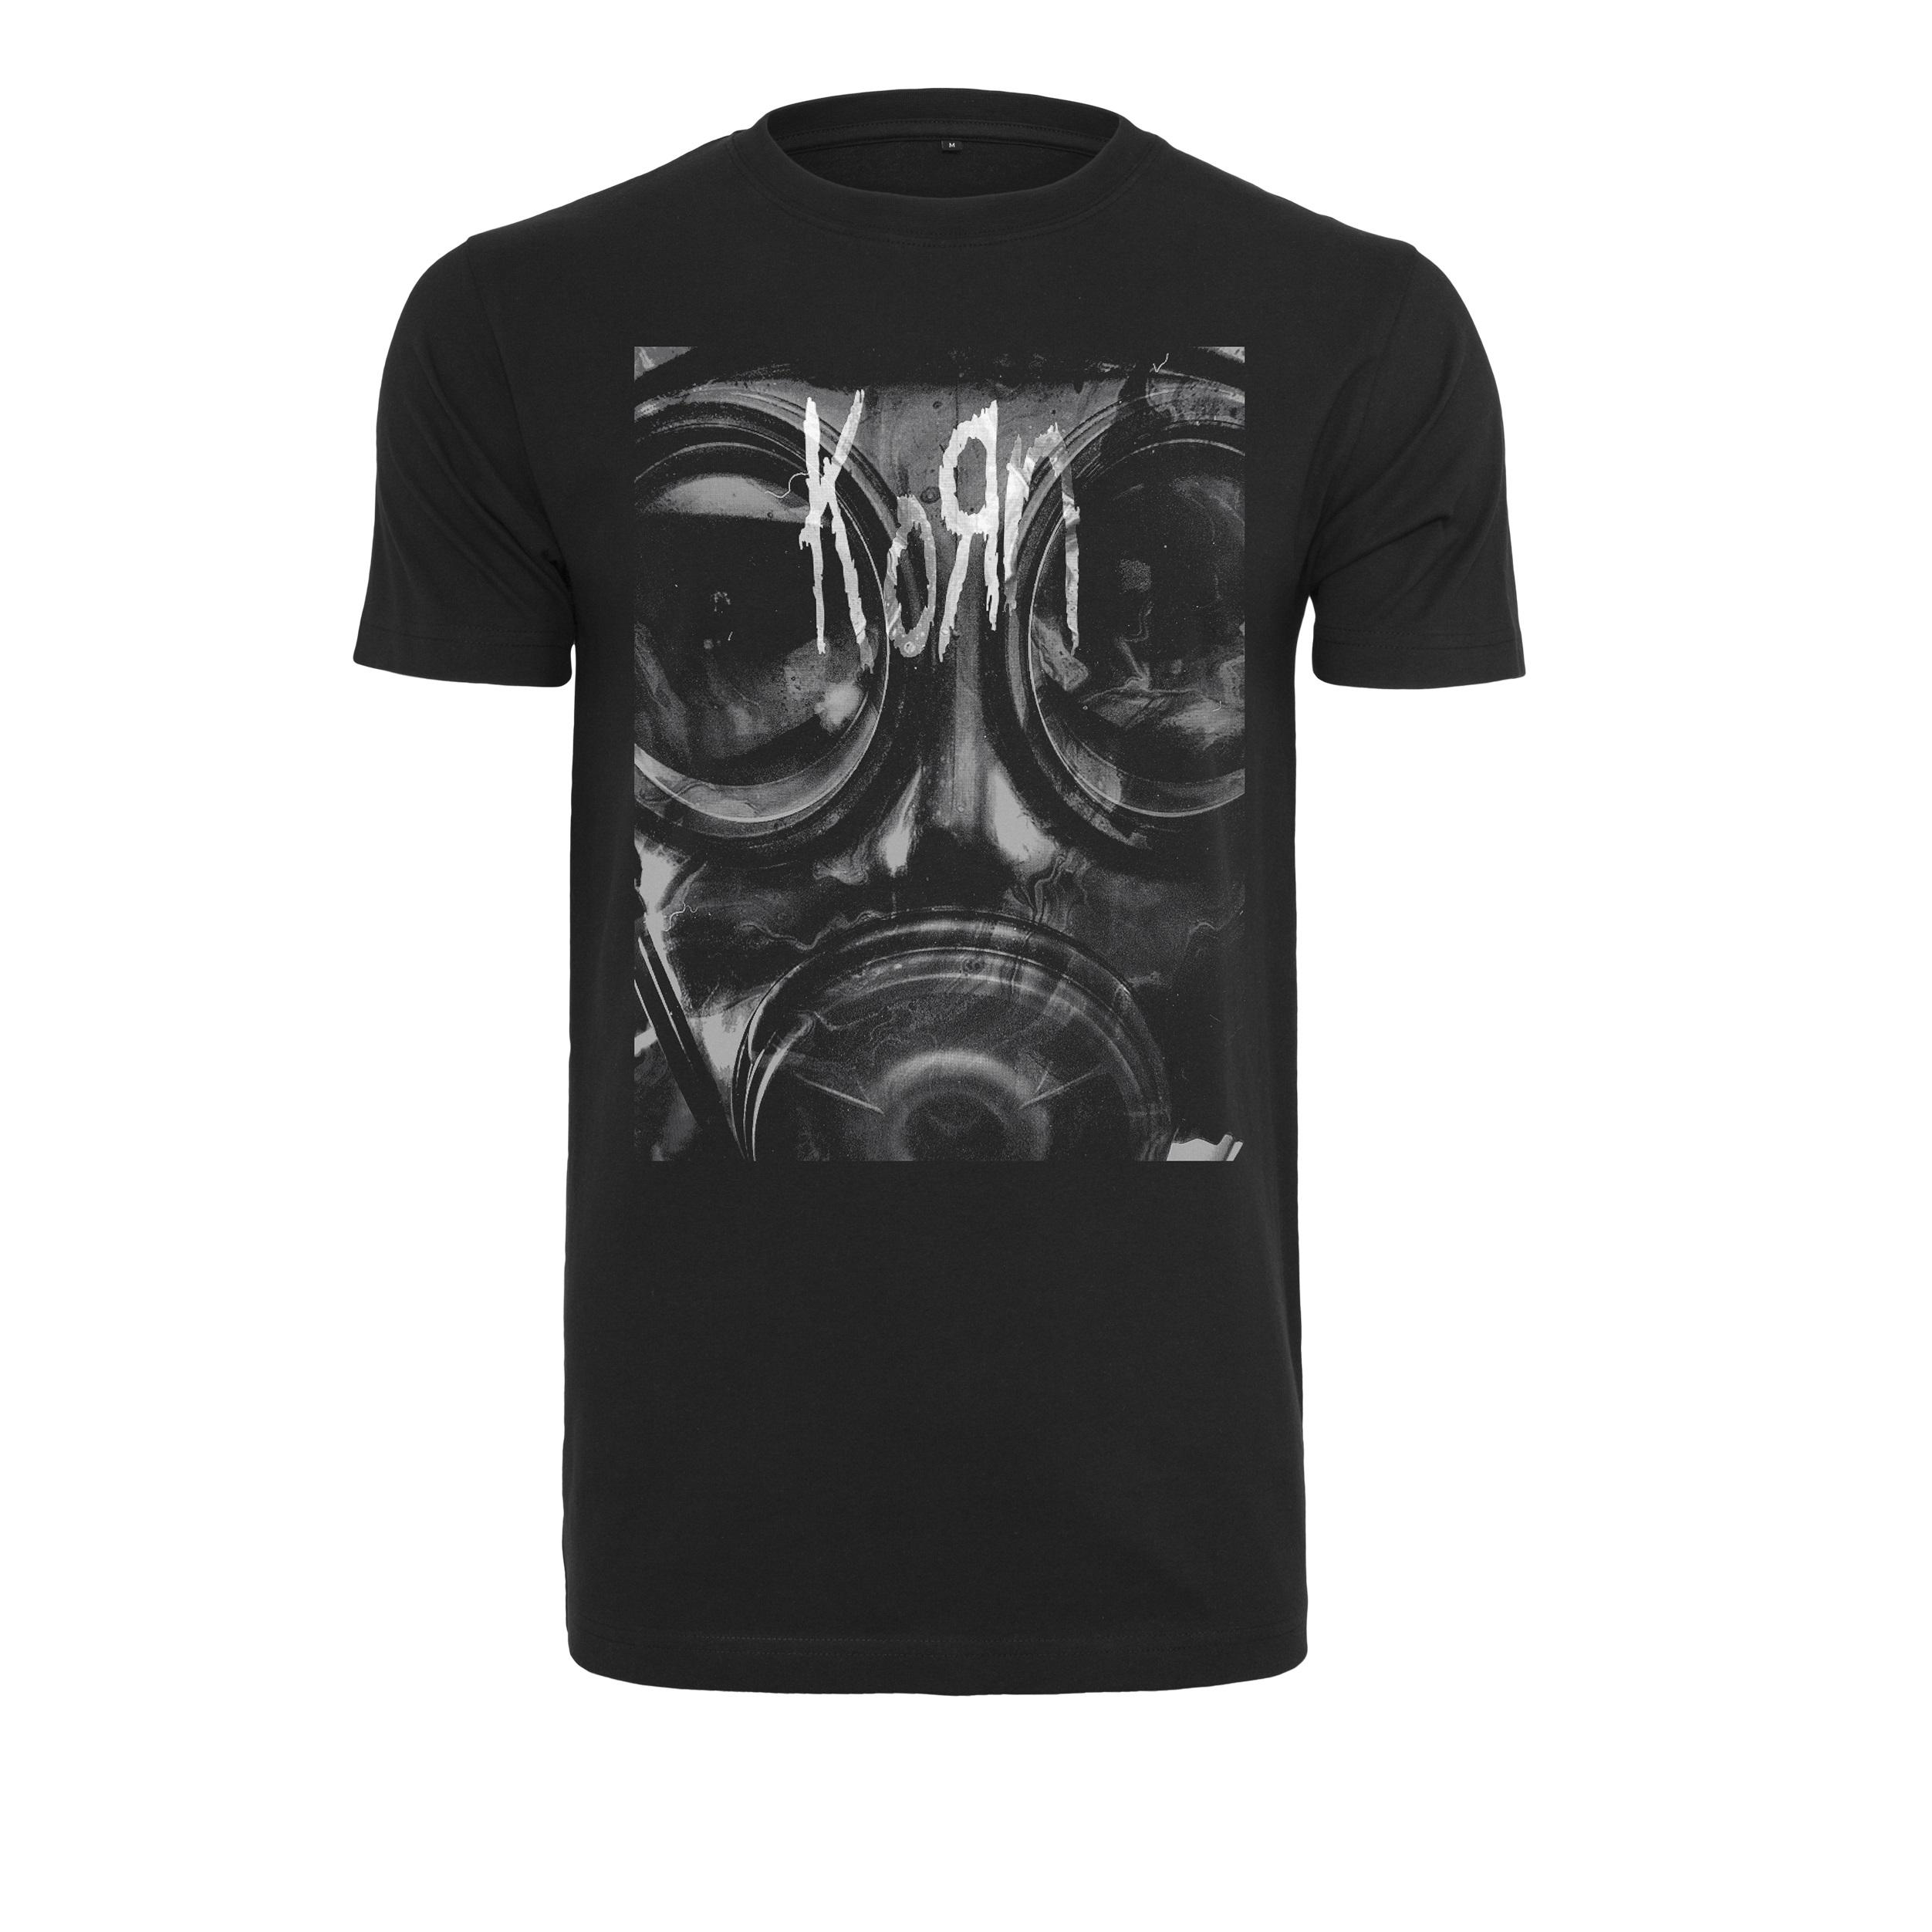 Korn - Tričko Asthma Tee - Muž, Čierna, S